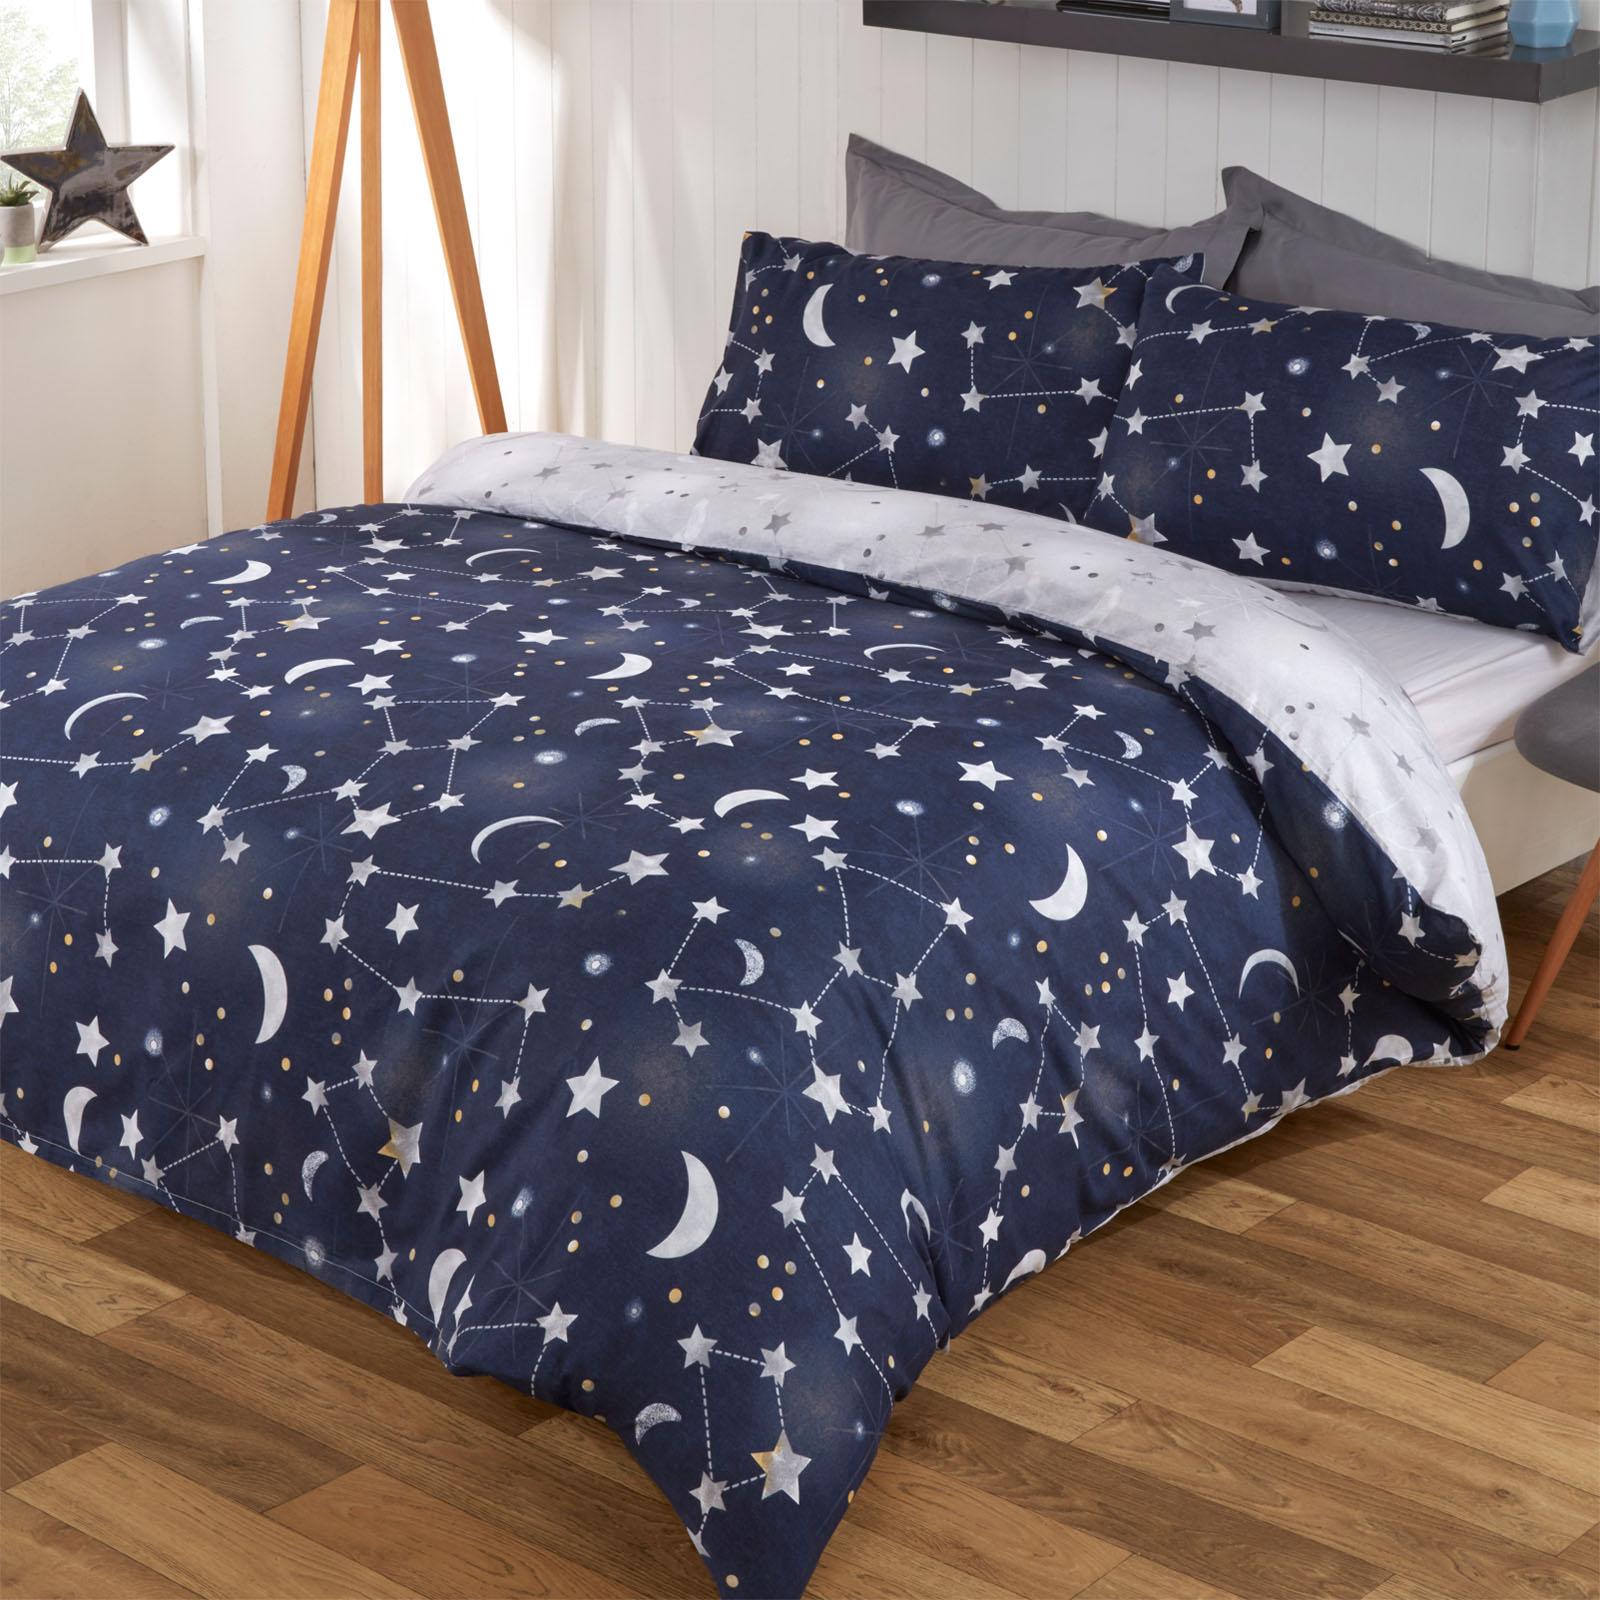 Bedding Sets Duvet Covers Dreamscene Moon Stars Galaxy Duvet Cover With Pillowcase Bedding Set Navy Grey Home Furniture Diy Tallergrafico Com Uy